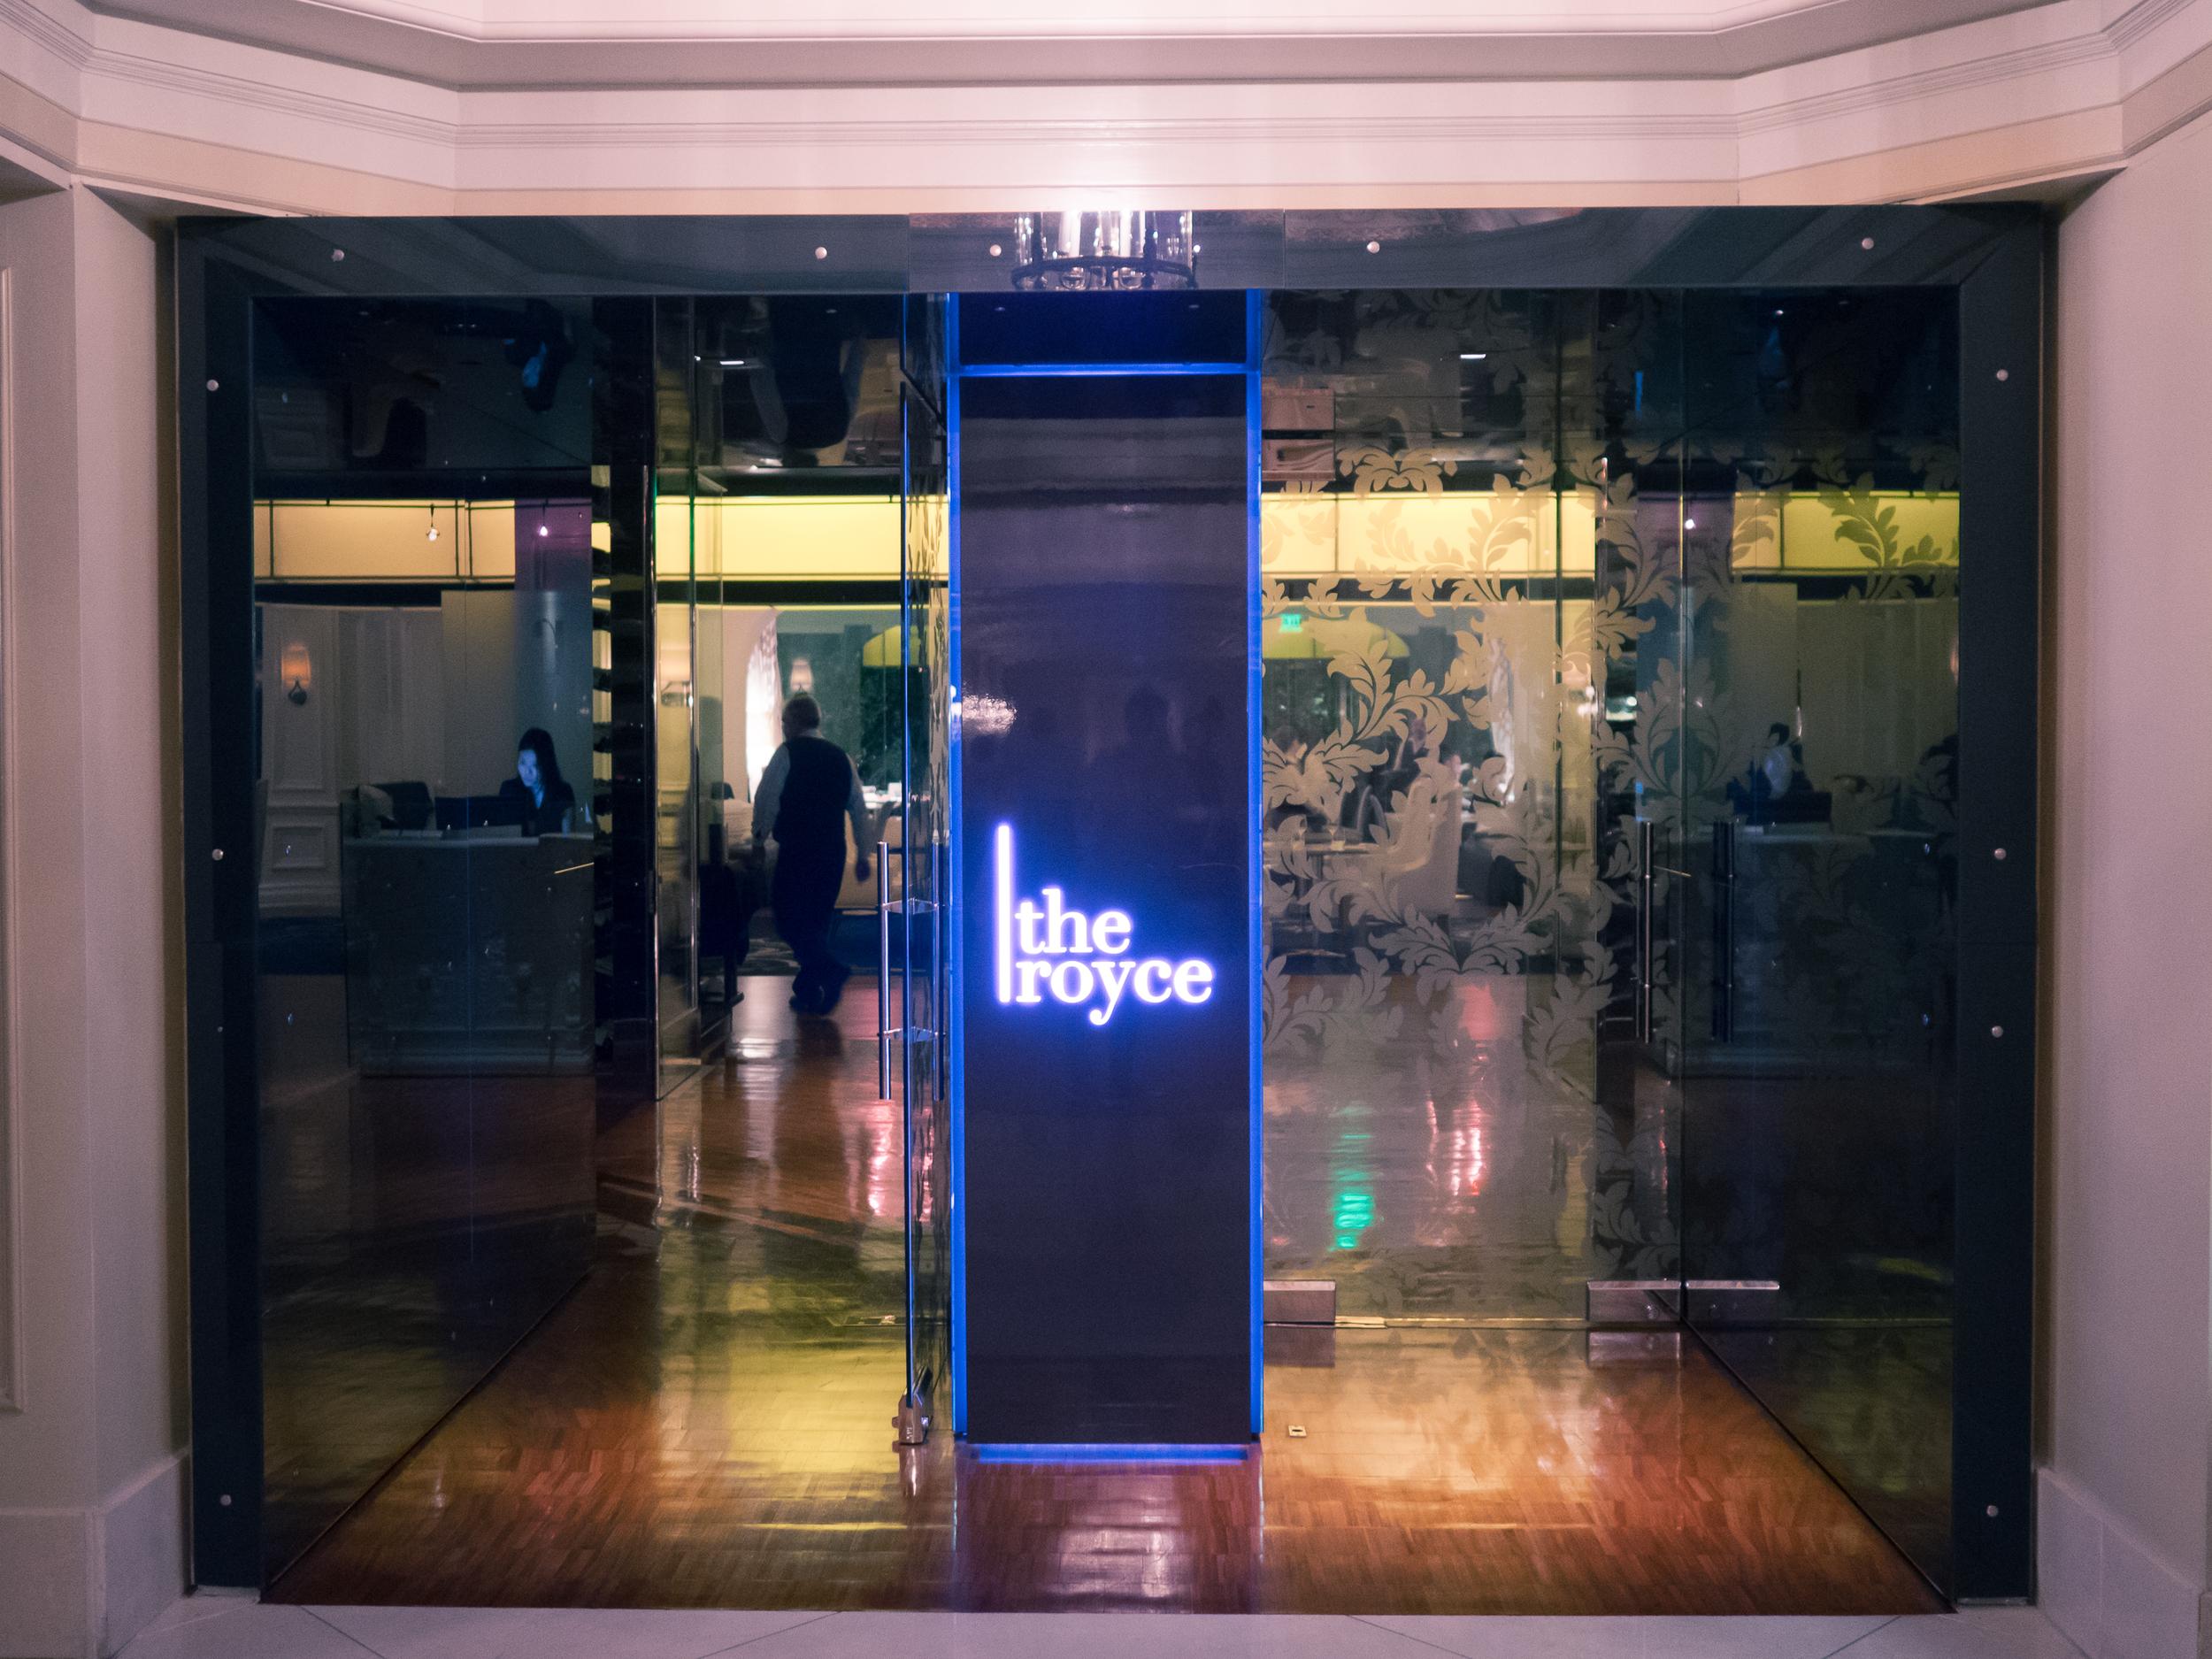 royce-entrance.jpg